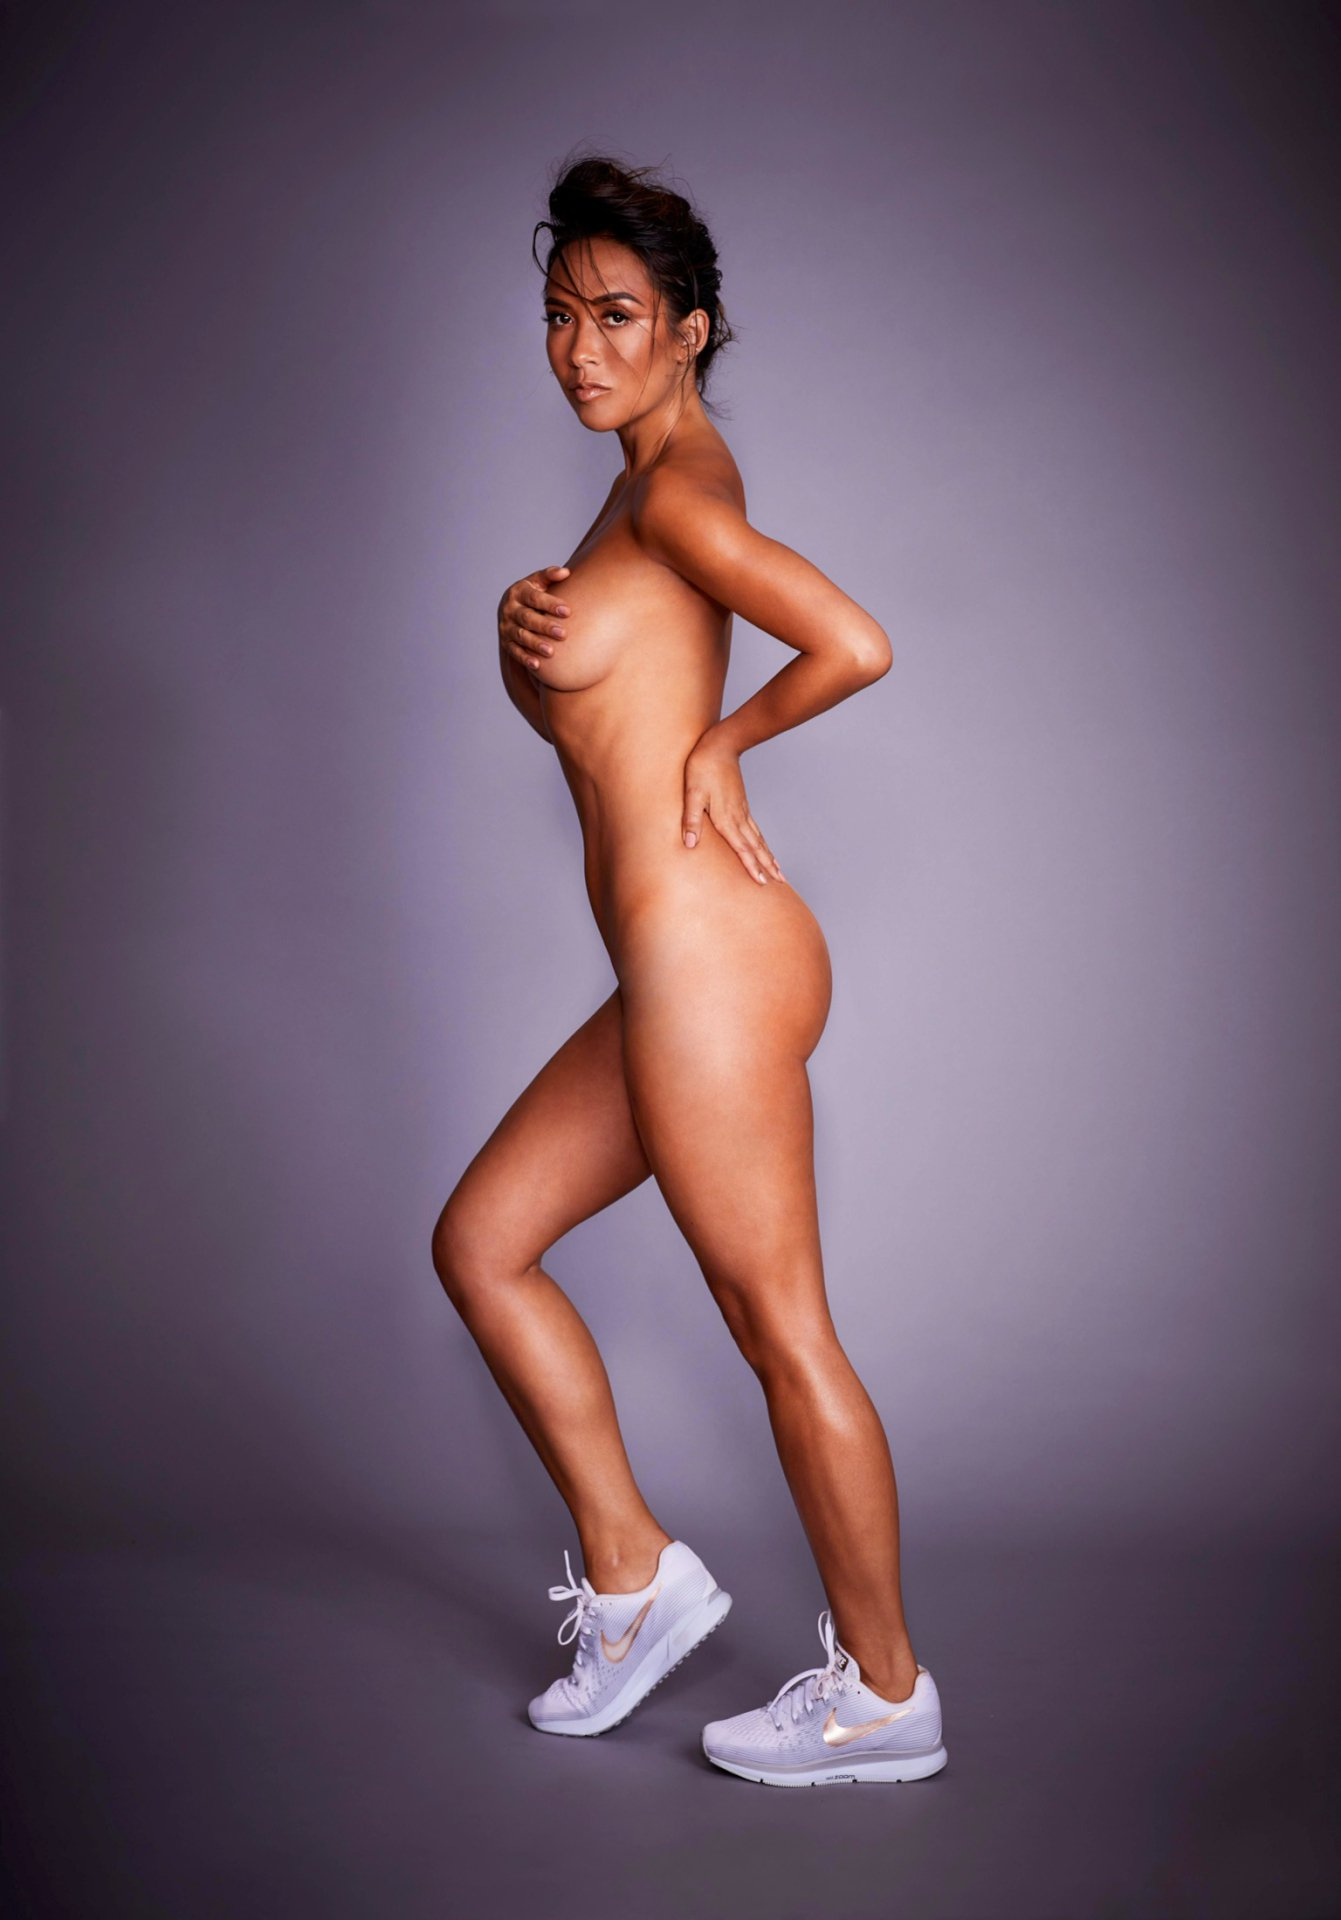 Free video gallery top body girls